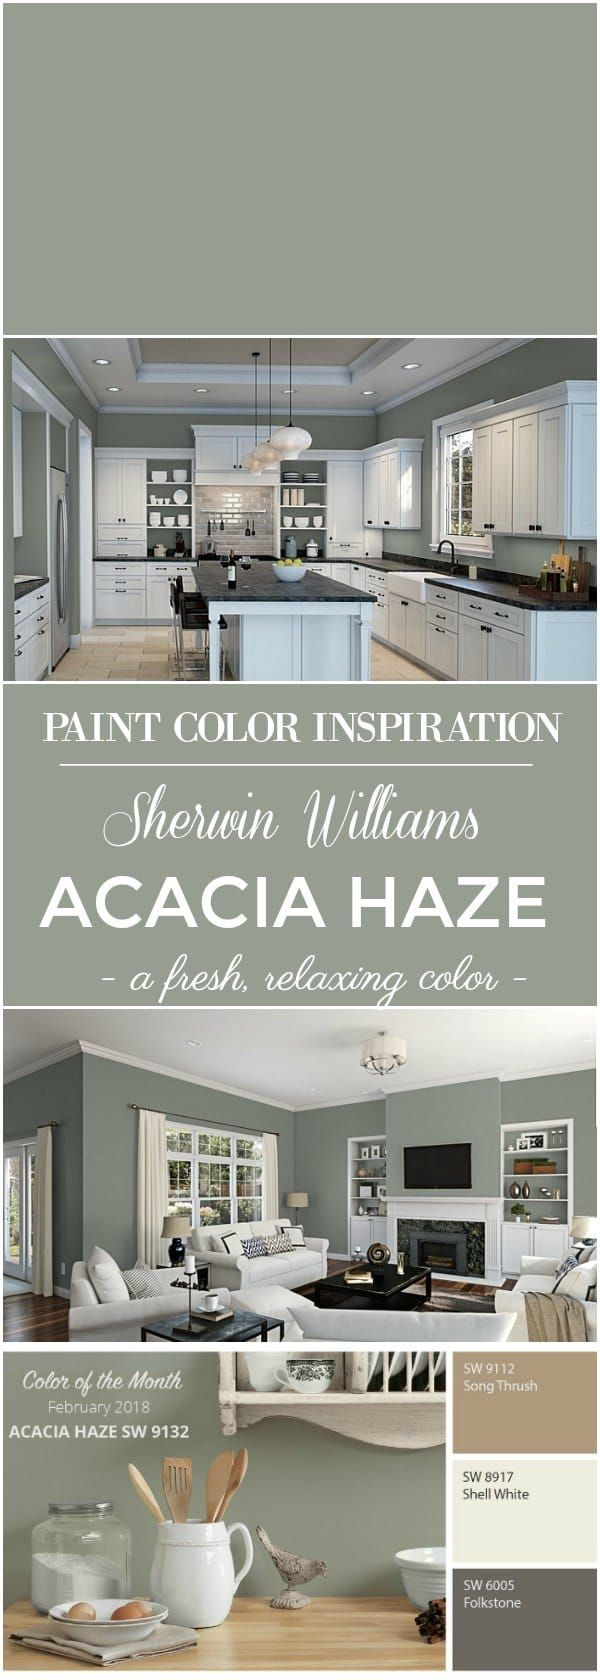 Sherwin Williams Acacia Haze Paint Color Paint Colors For Home Paint Colors For Living Room Room Paint Colors #sherwin #williams #paint #colors #for #living #room